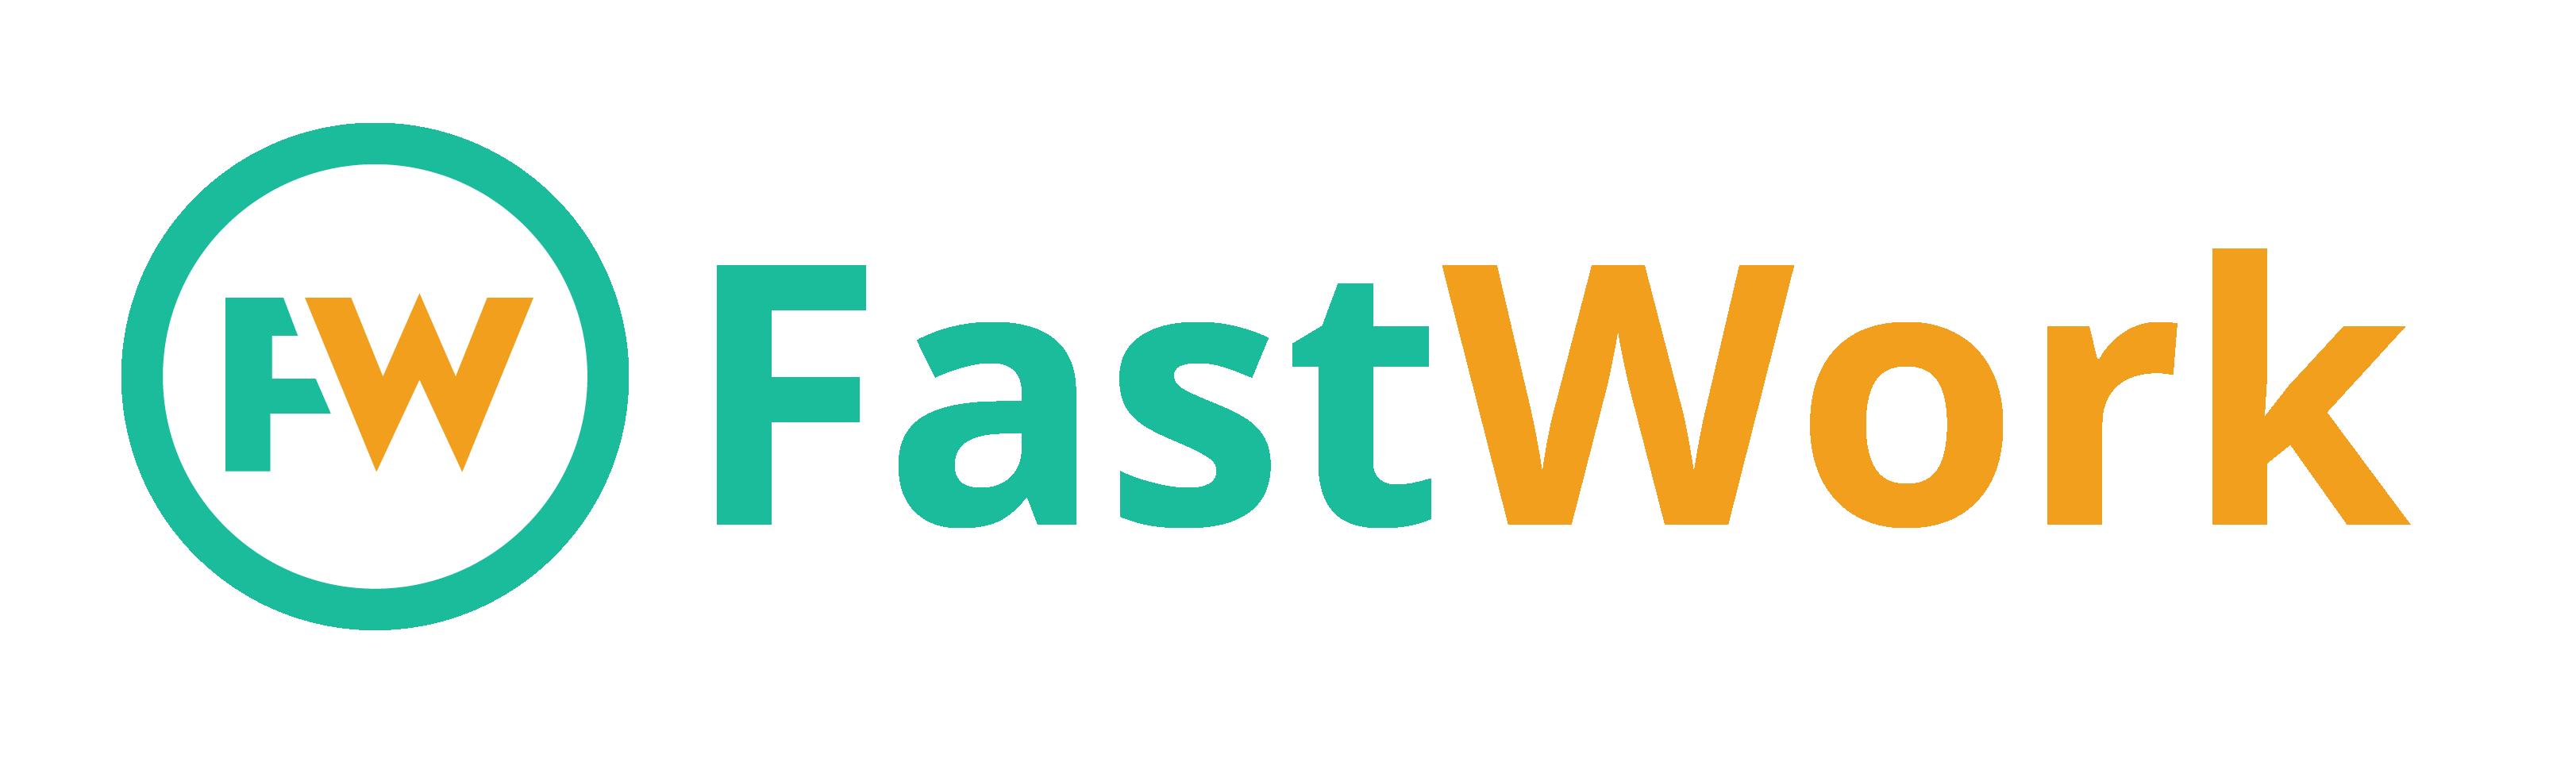 Fastwork.vn